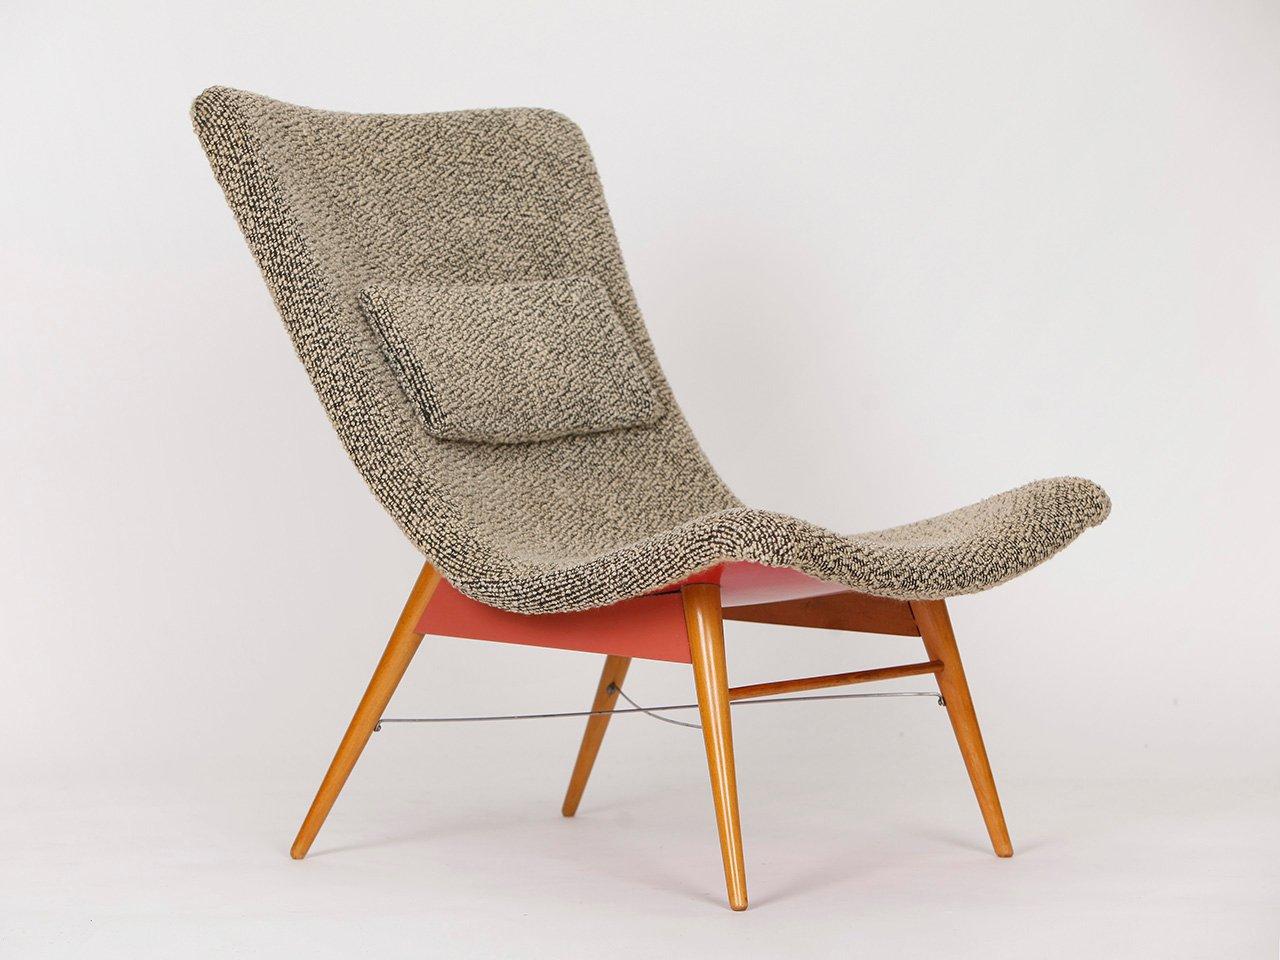 Mid century stuhl von miroslav navratil f r cesky nabytek 1960er bei pamono kaufen - Mid century stuhl ...